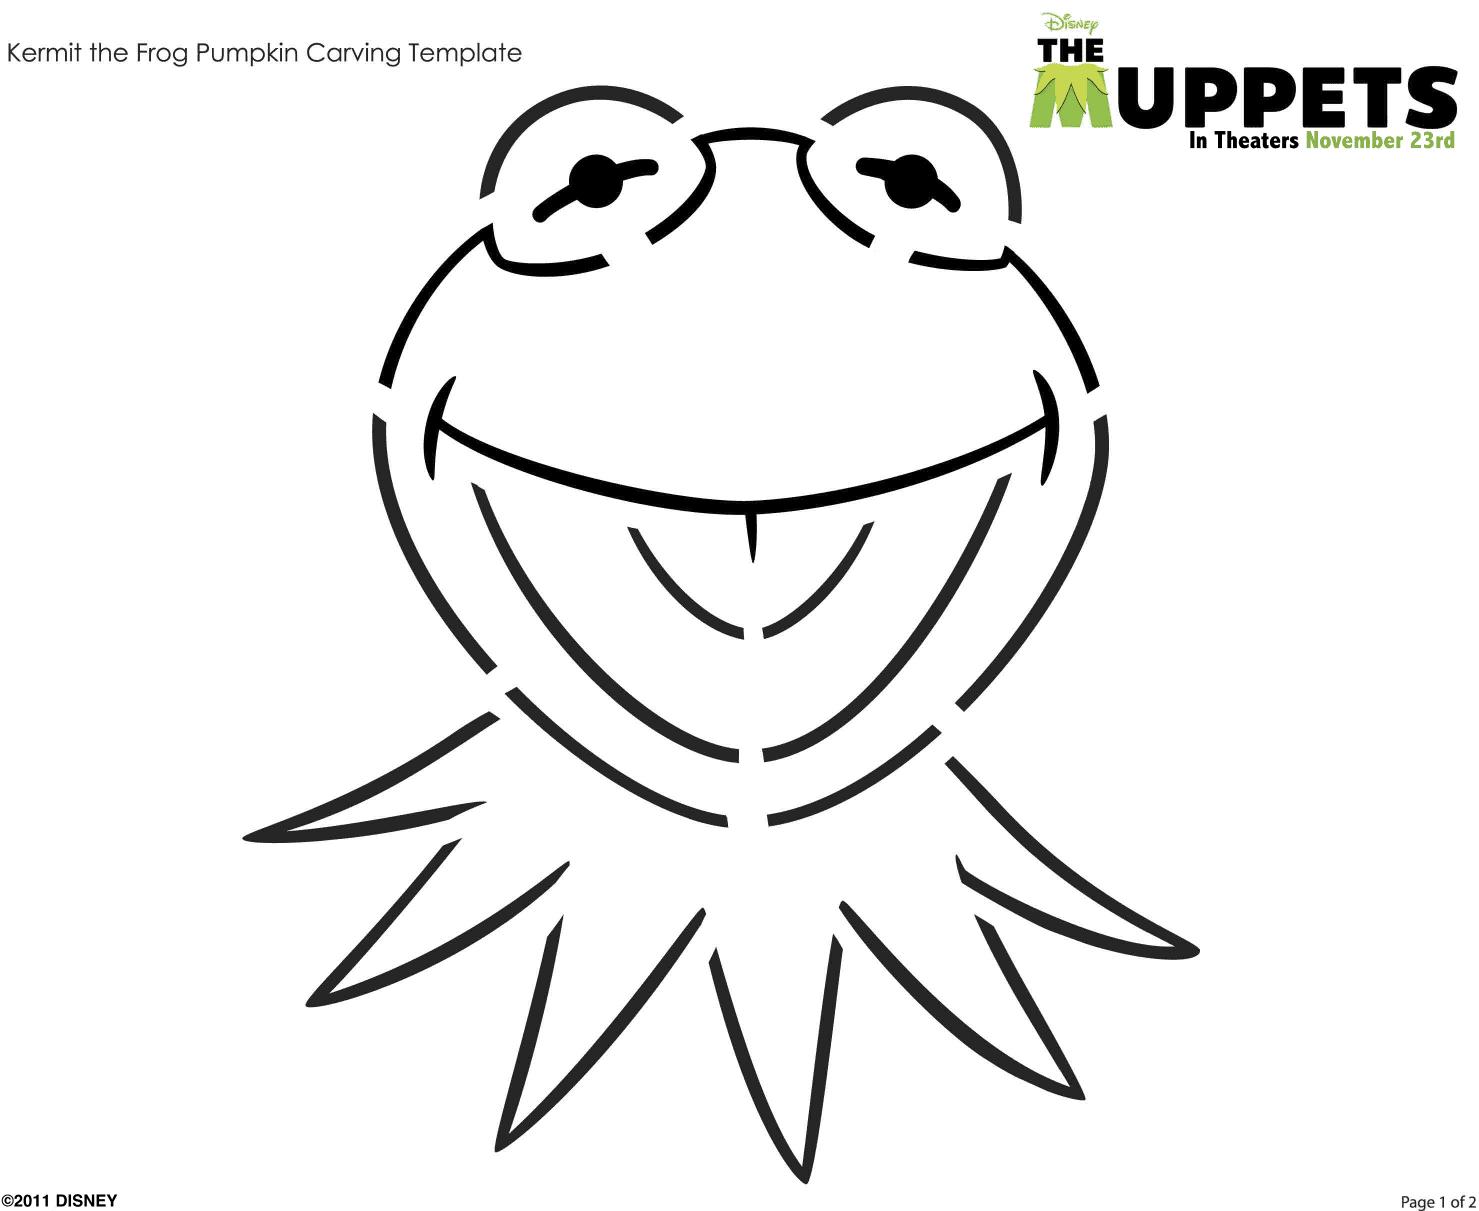 KermitPumpkinCarving1